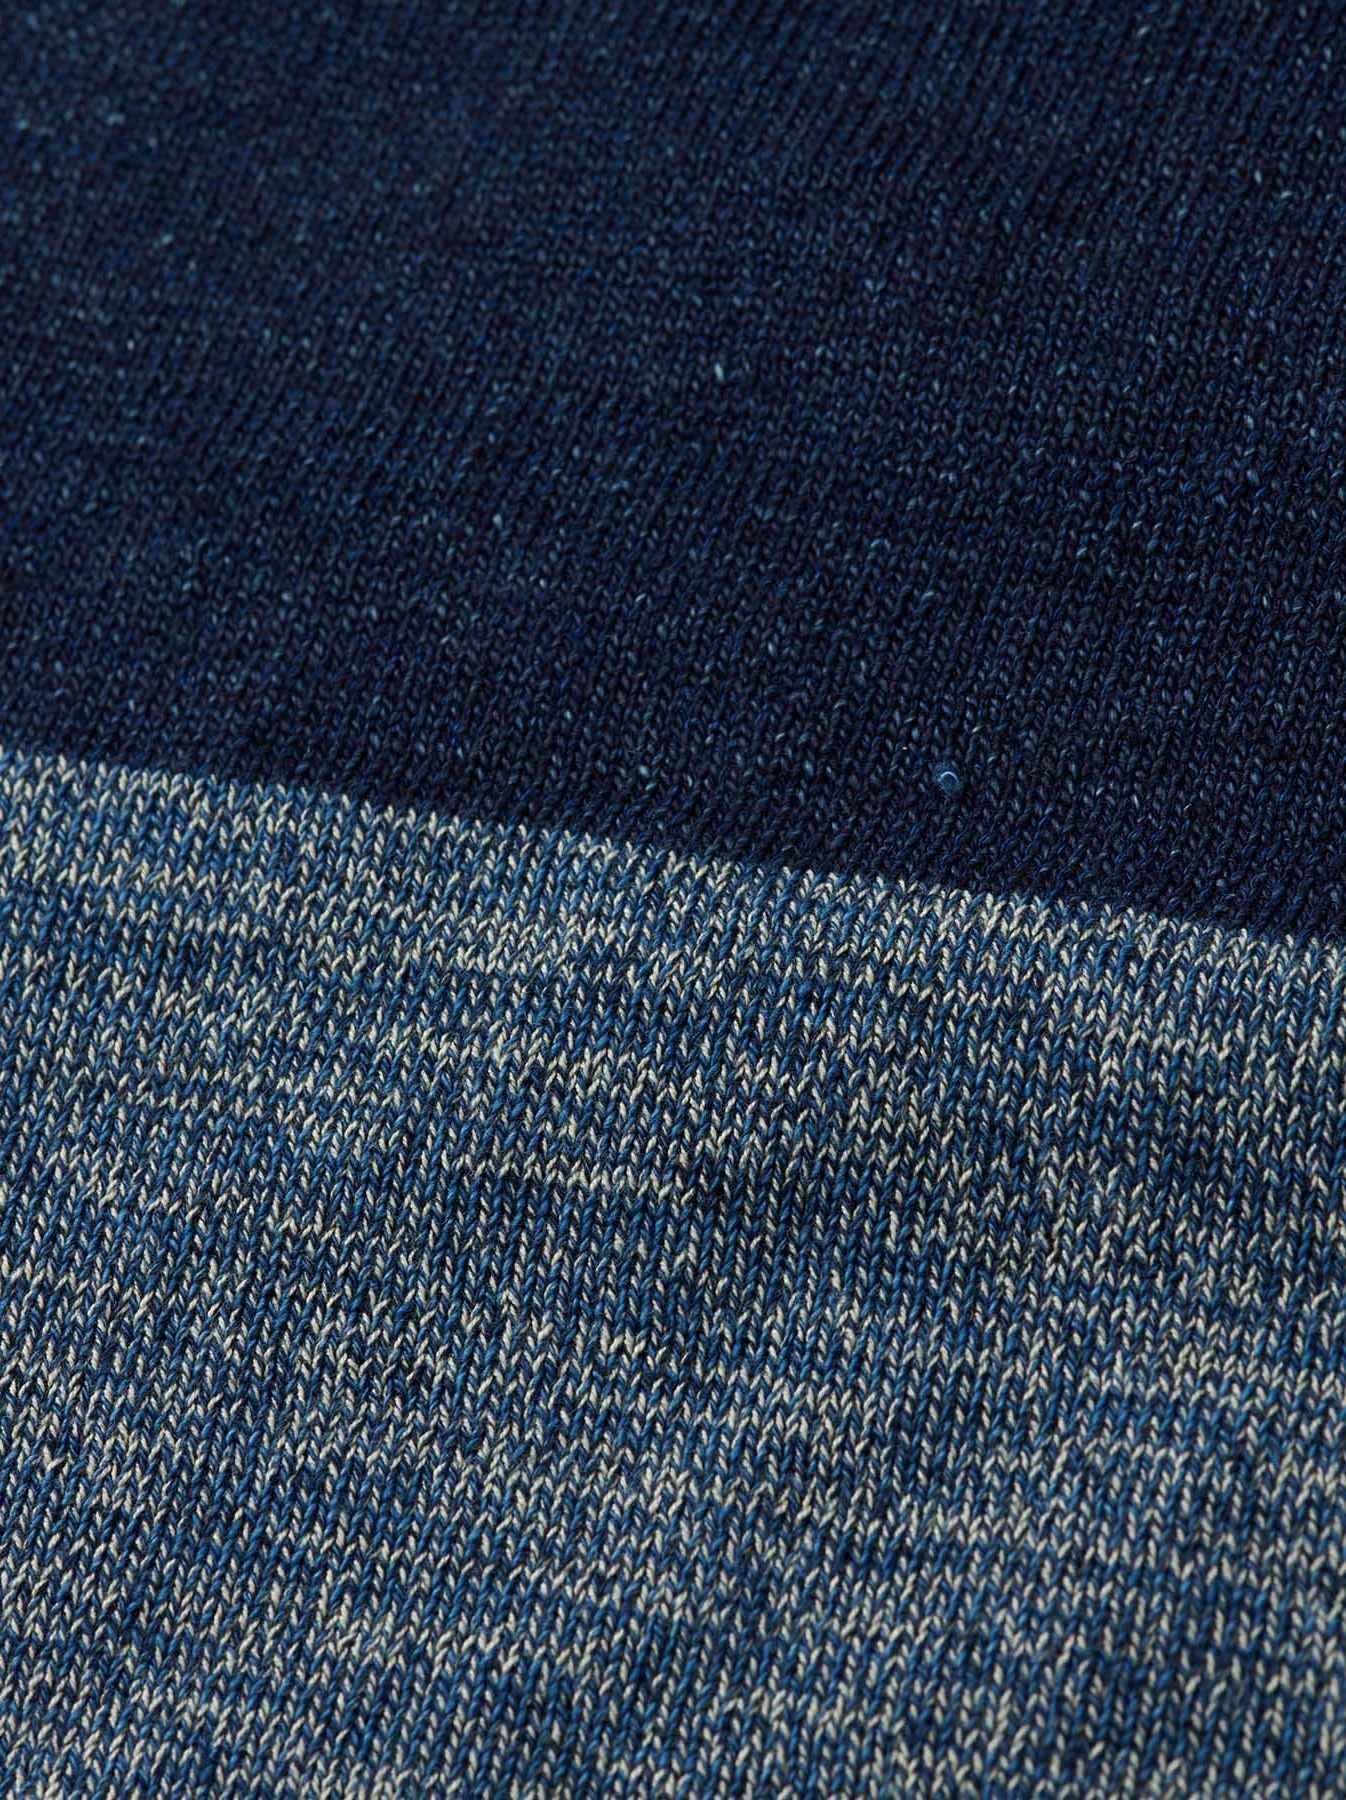 WH Gauze Basque Knit T-shirt-6